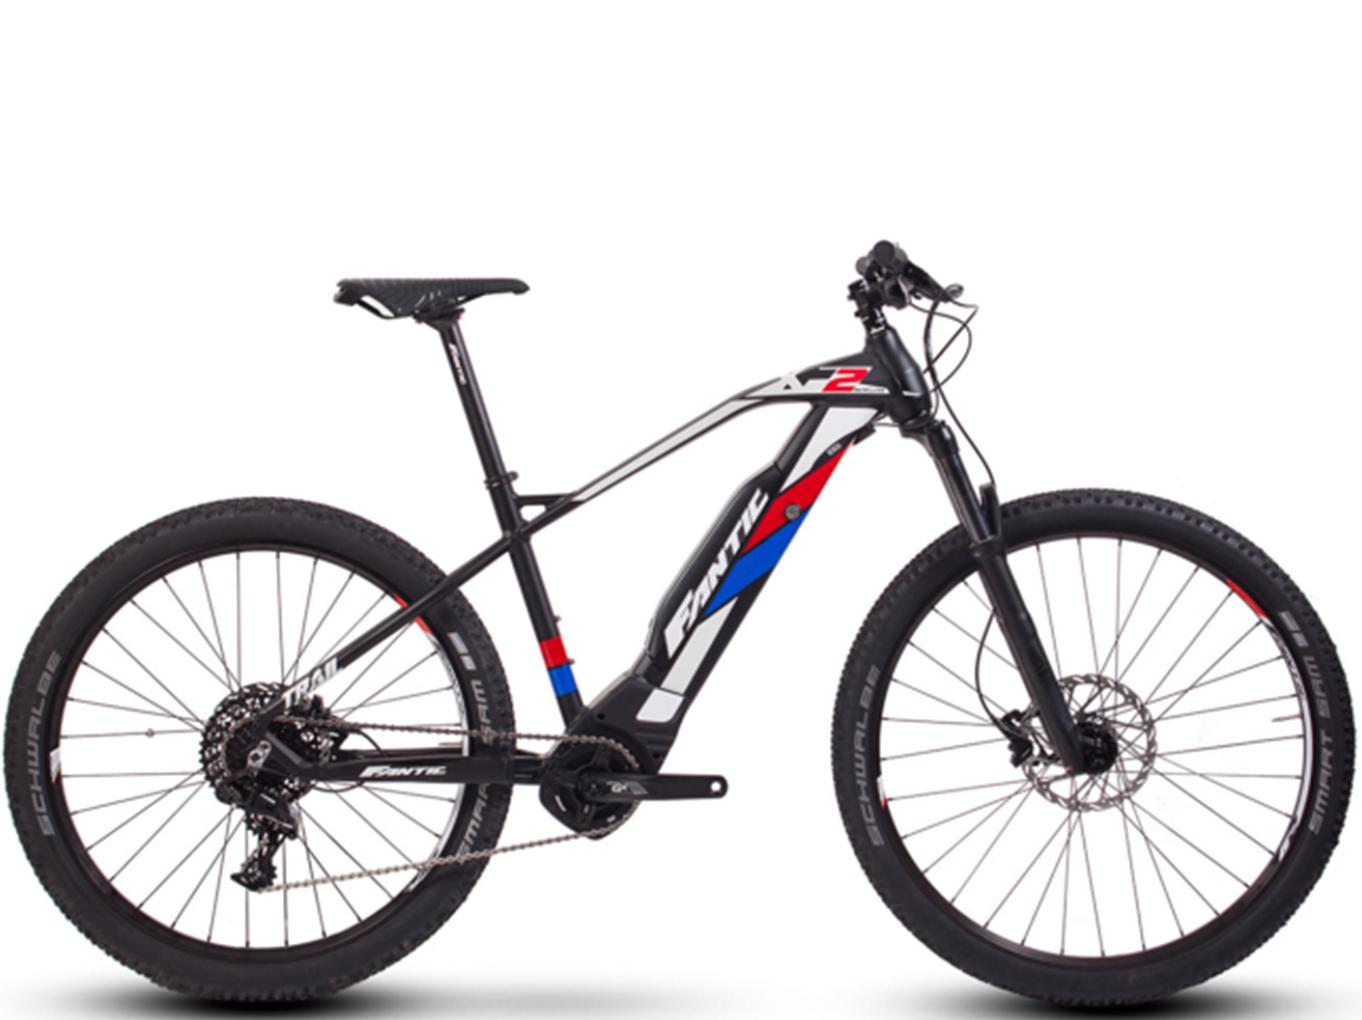 Foto de la bicicleta eléctrica deportiva